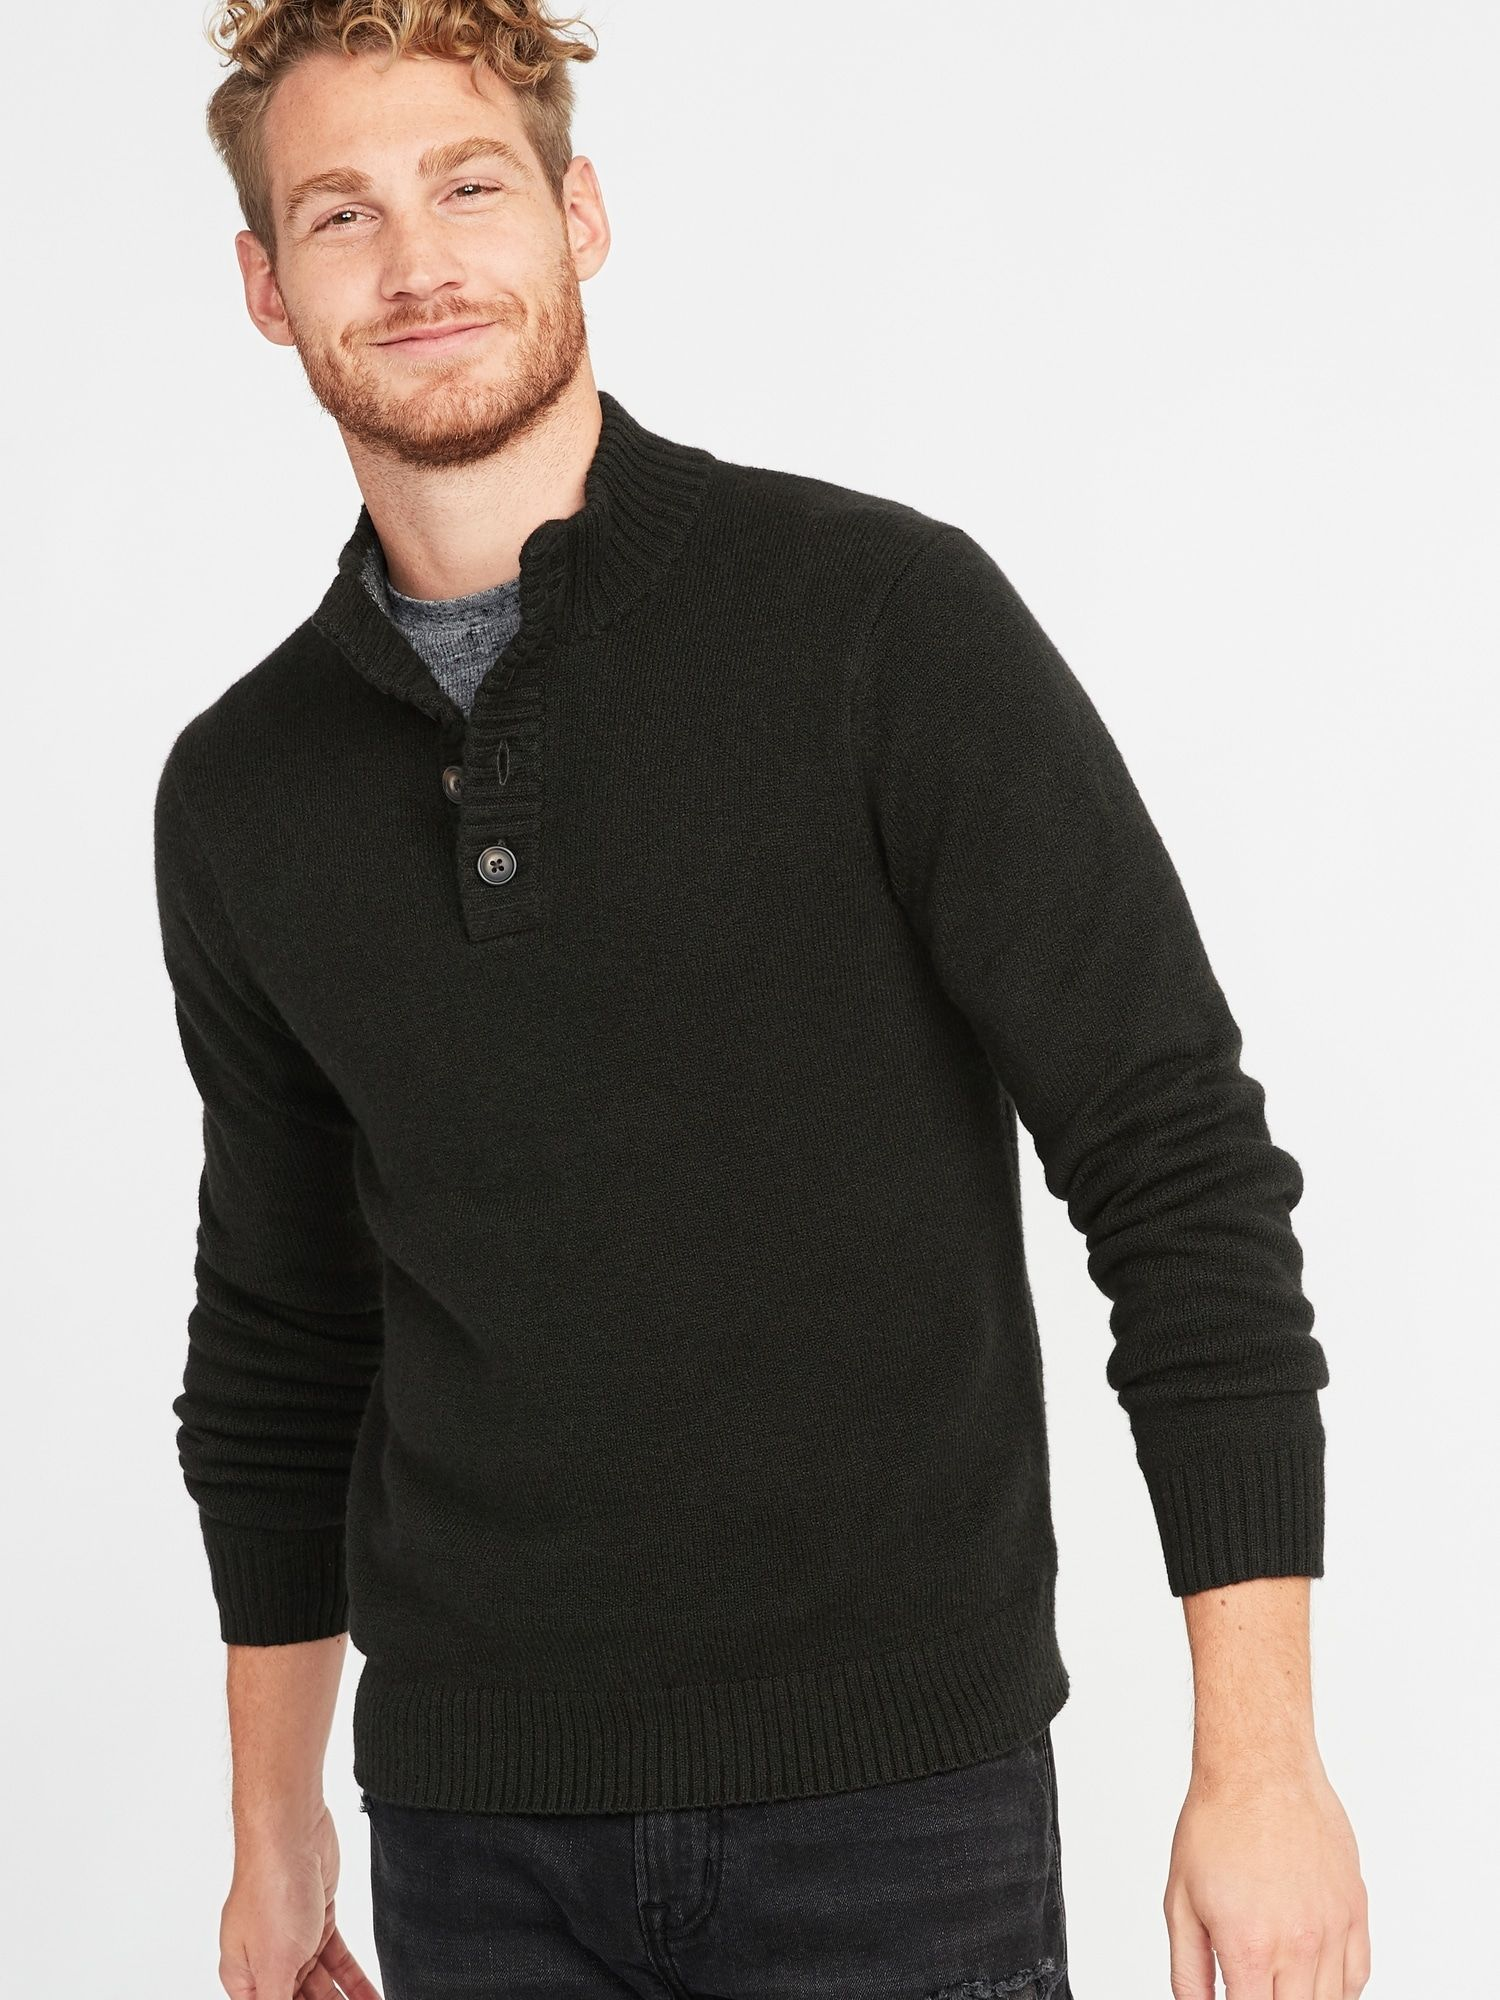 ca84ae449ad97 Button Mock-Neck Sweater for Men in 2019 | wishlist | Men sweater ...